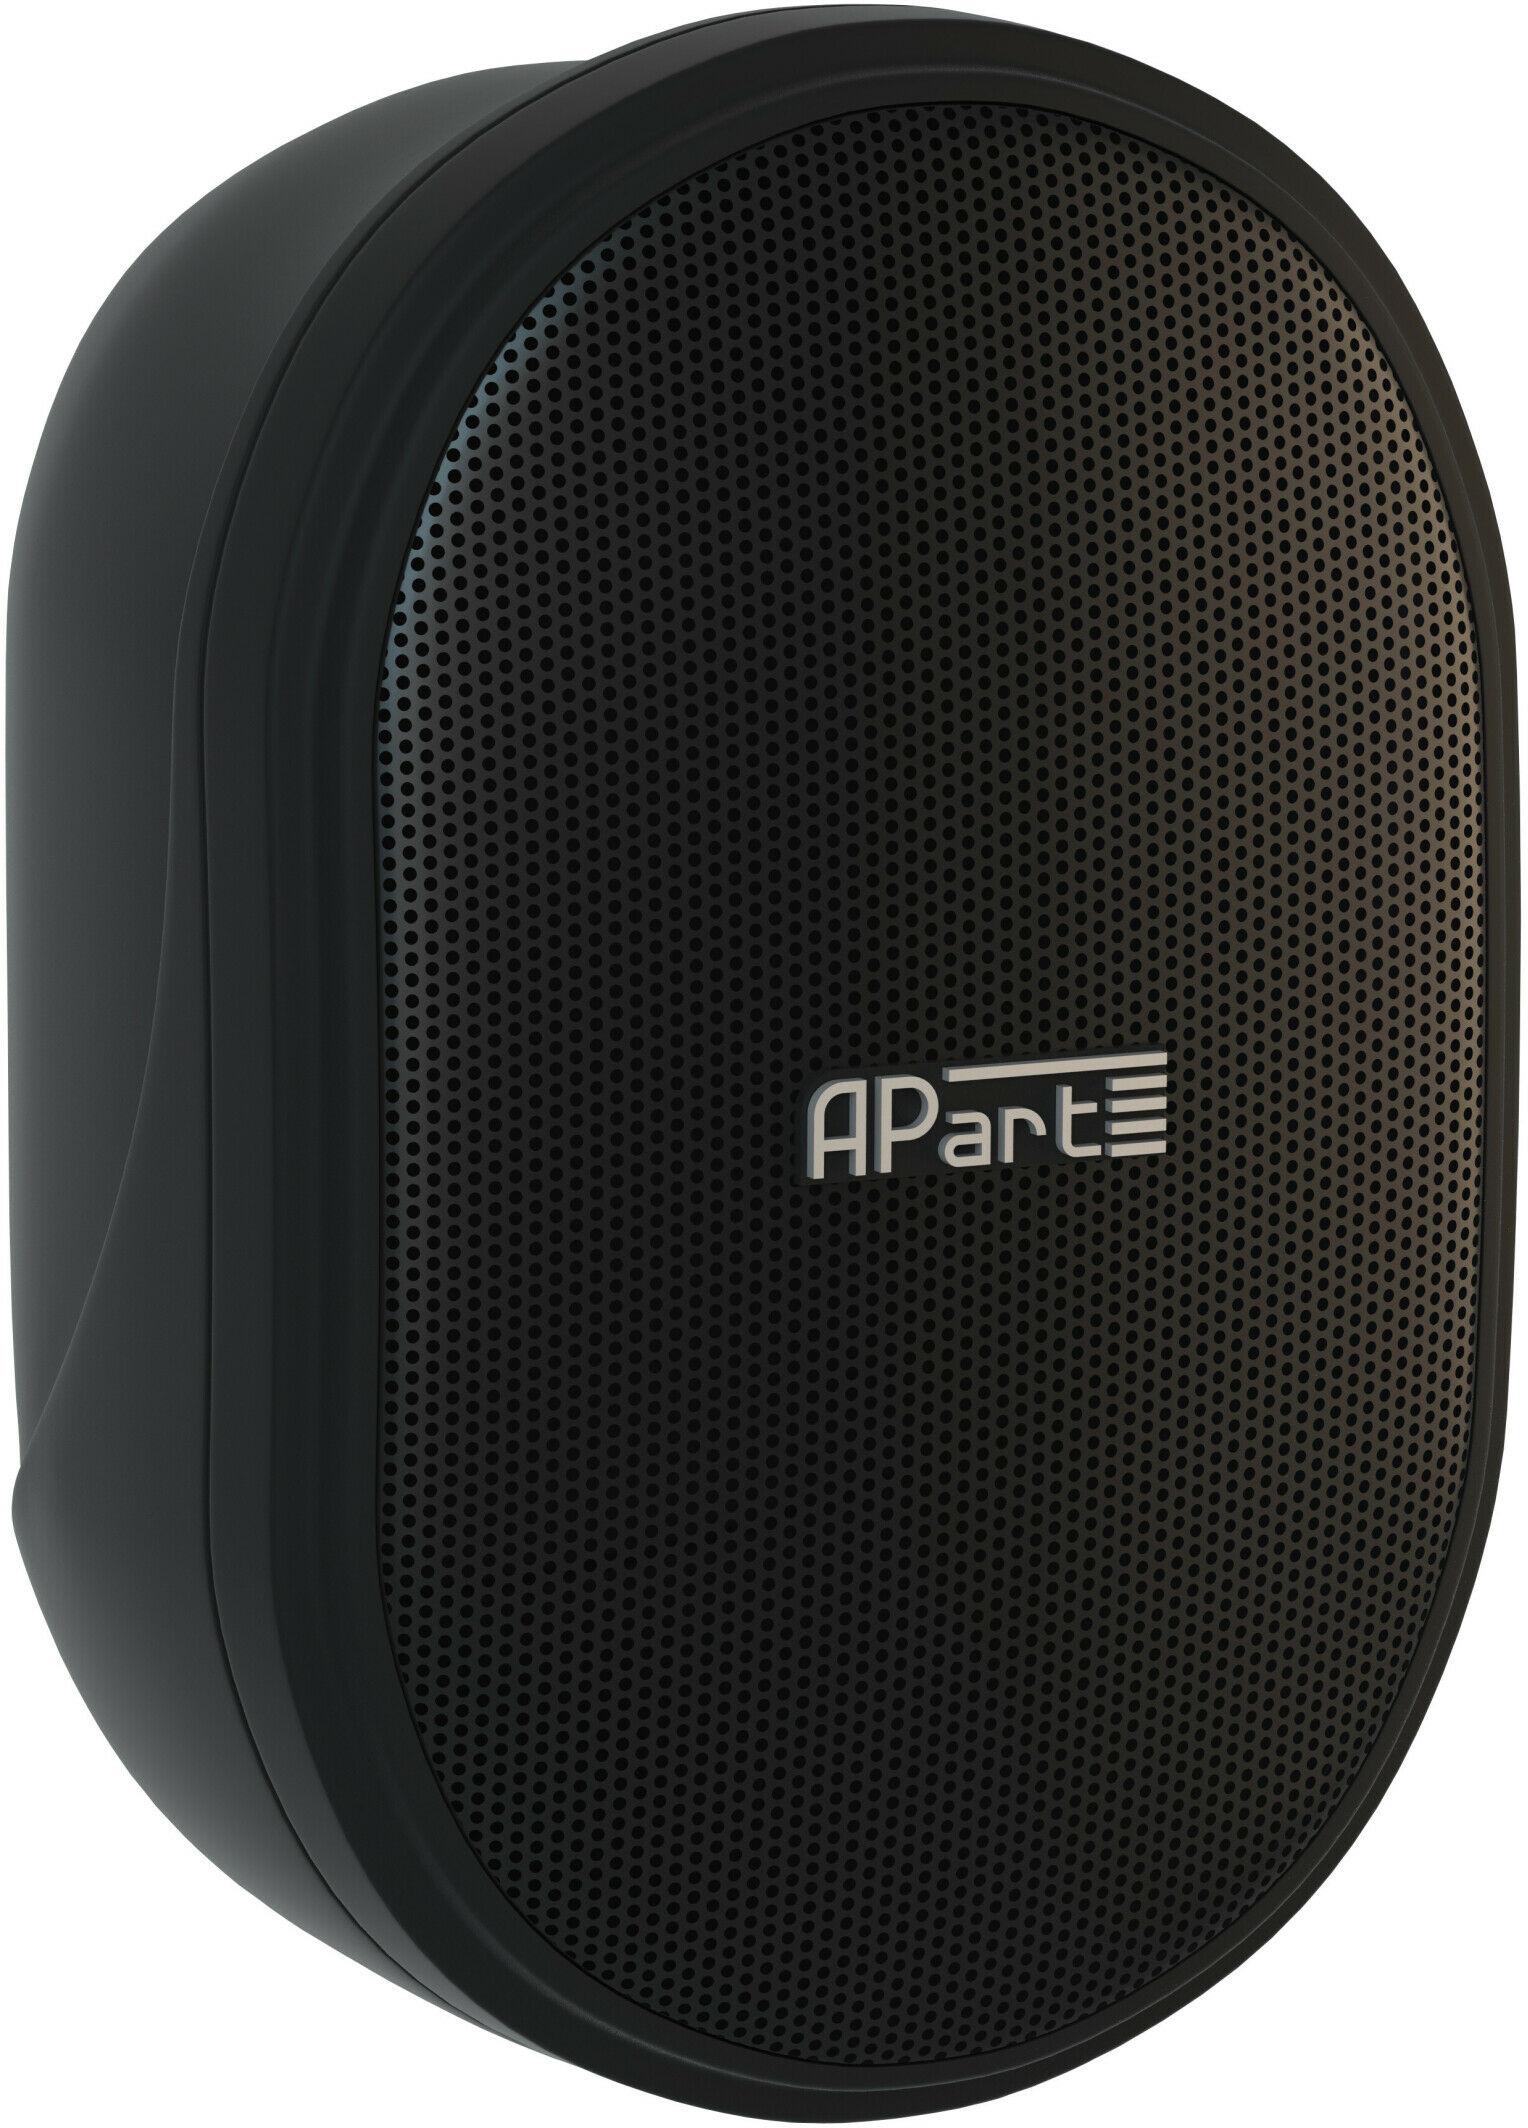 APart OVO3T / 1 para - 100 V 40 W głośniki - kolor czarny